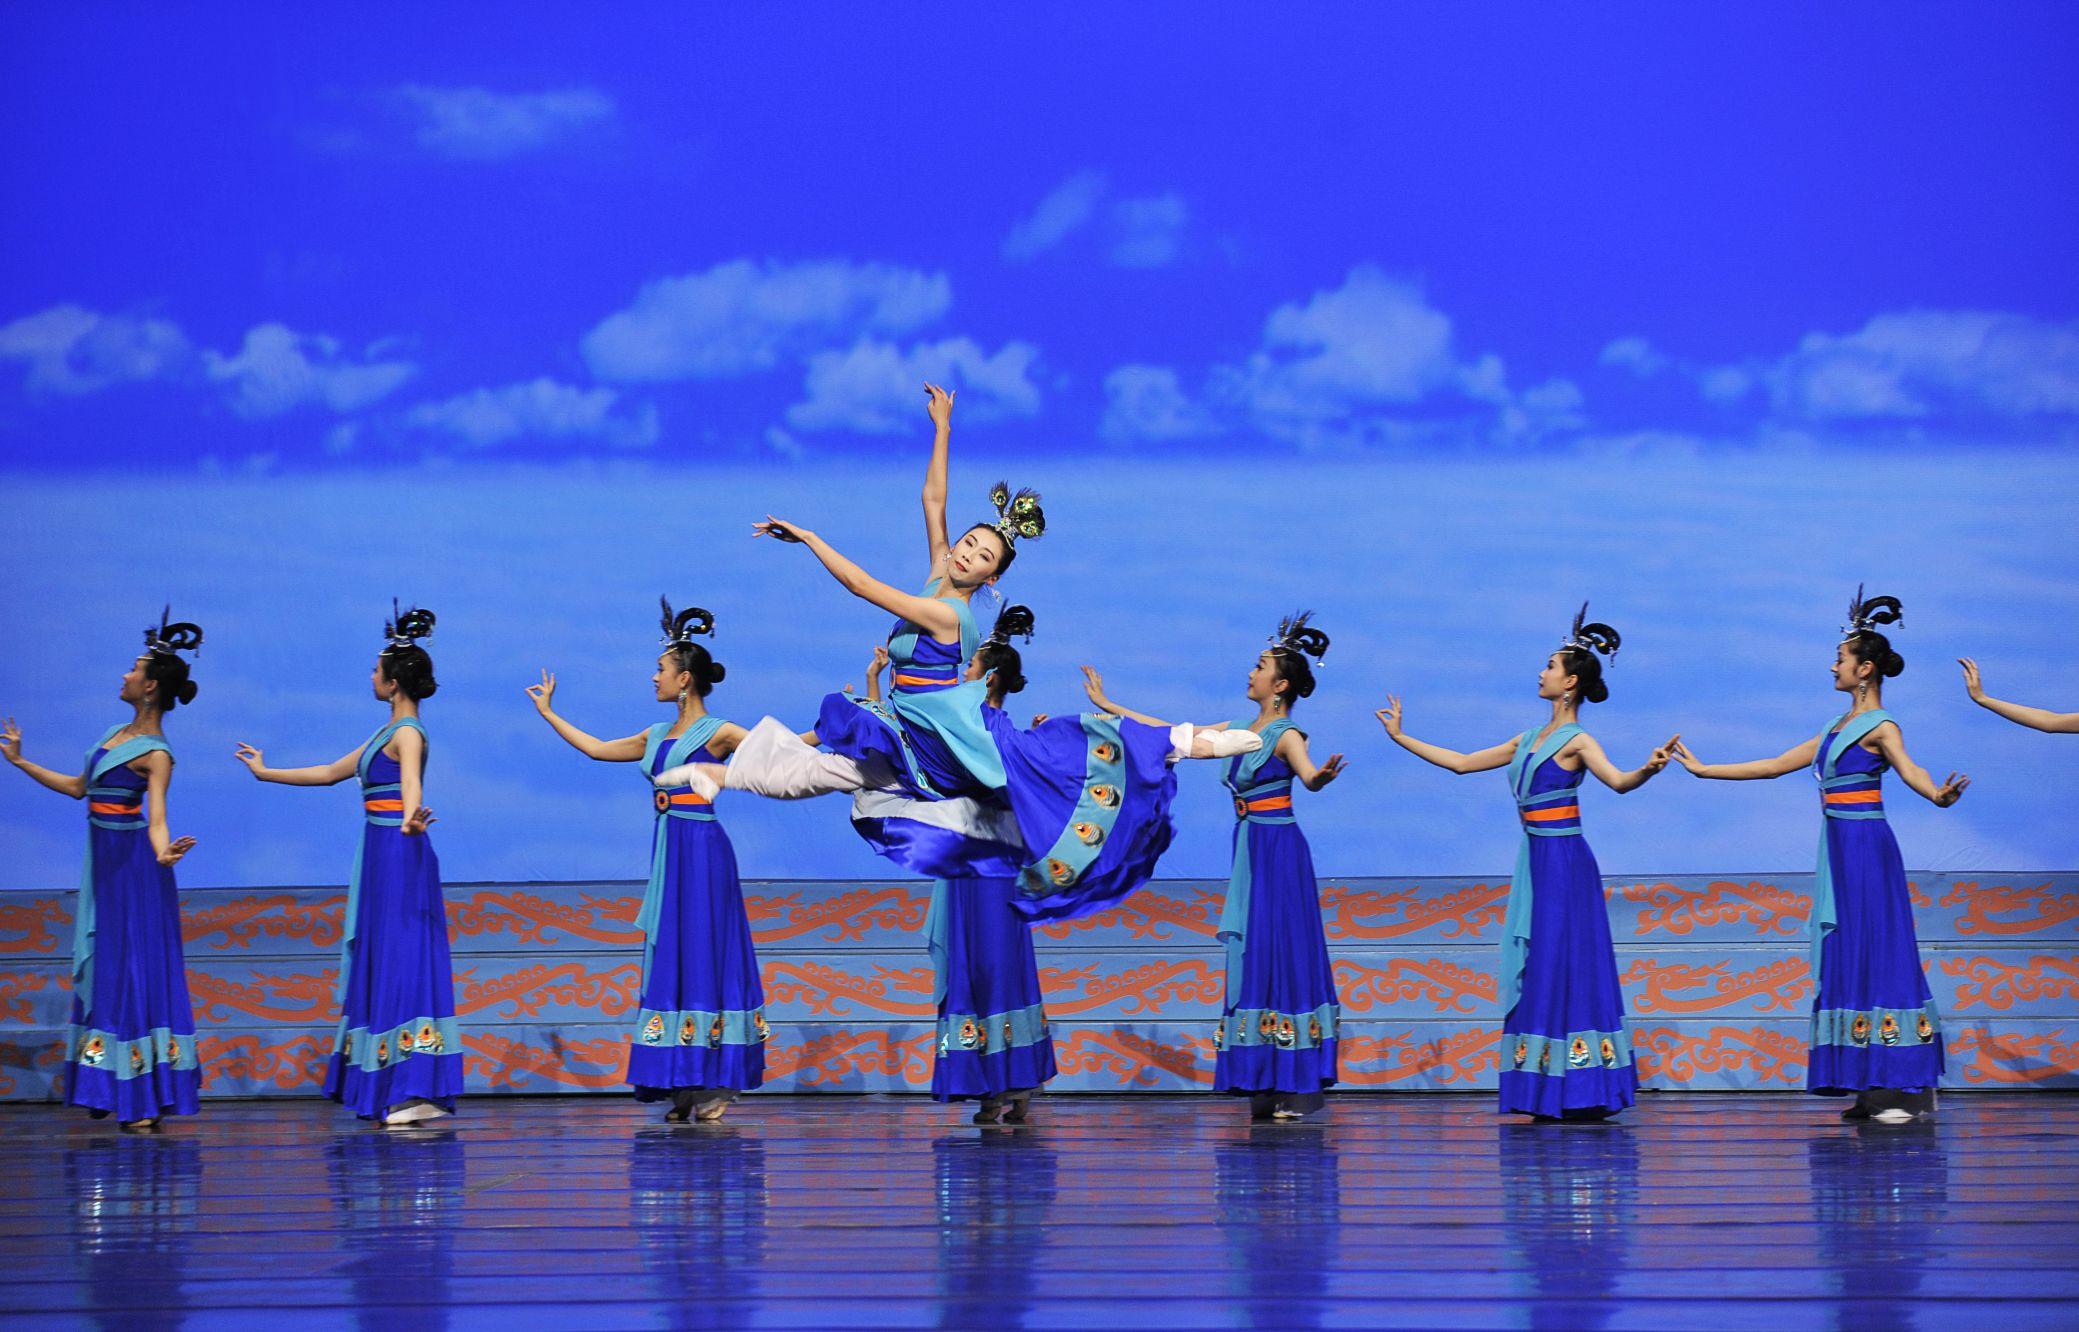 Chinesische Kultur am Anfang einer Renaissance